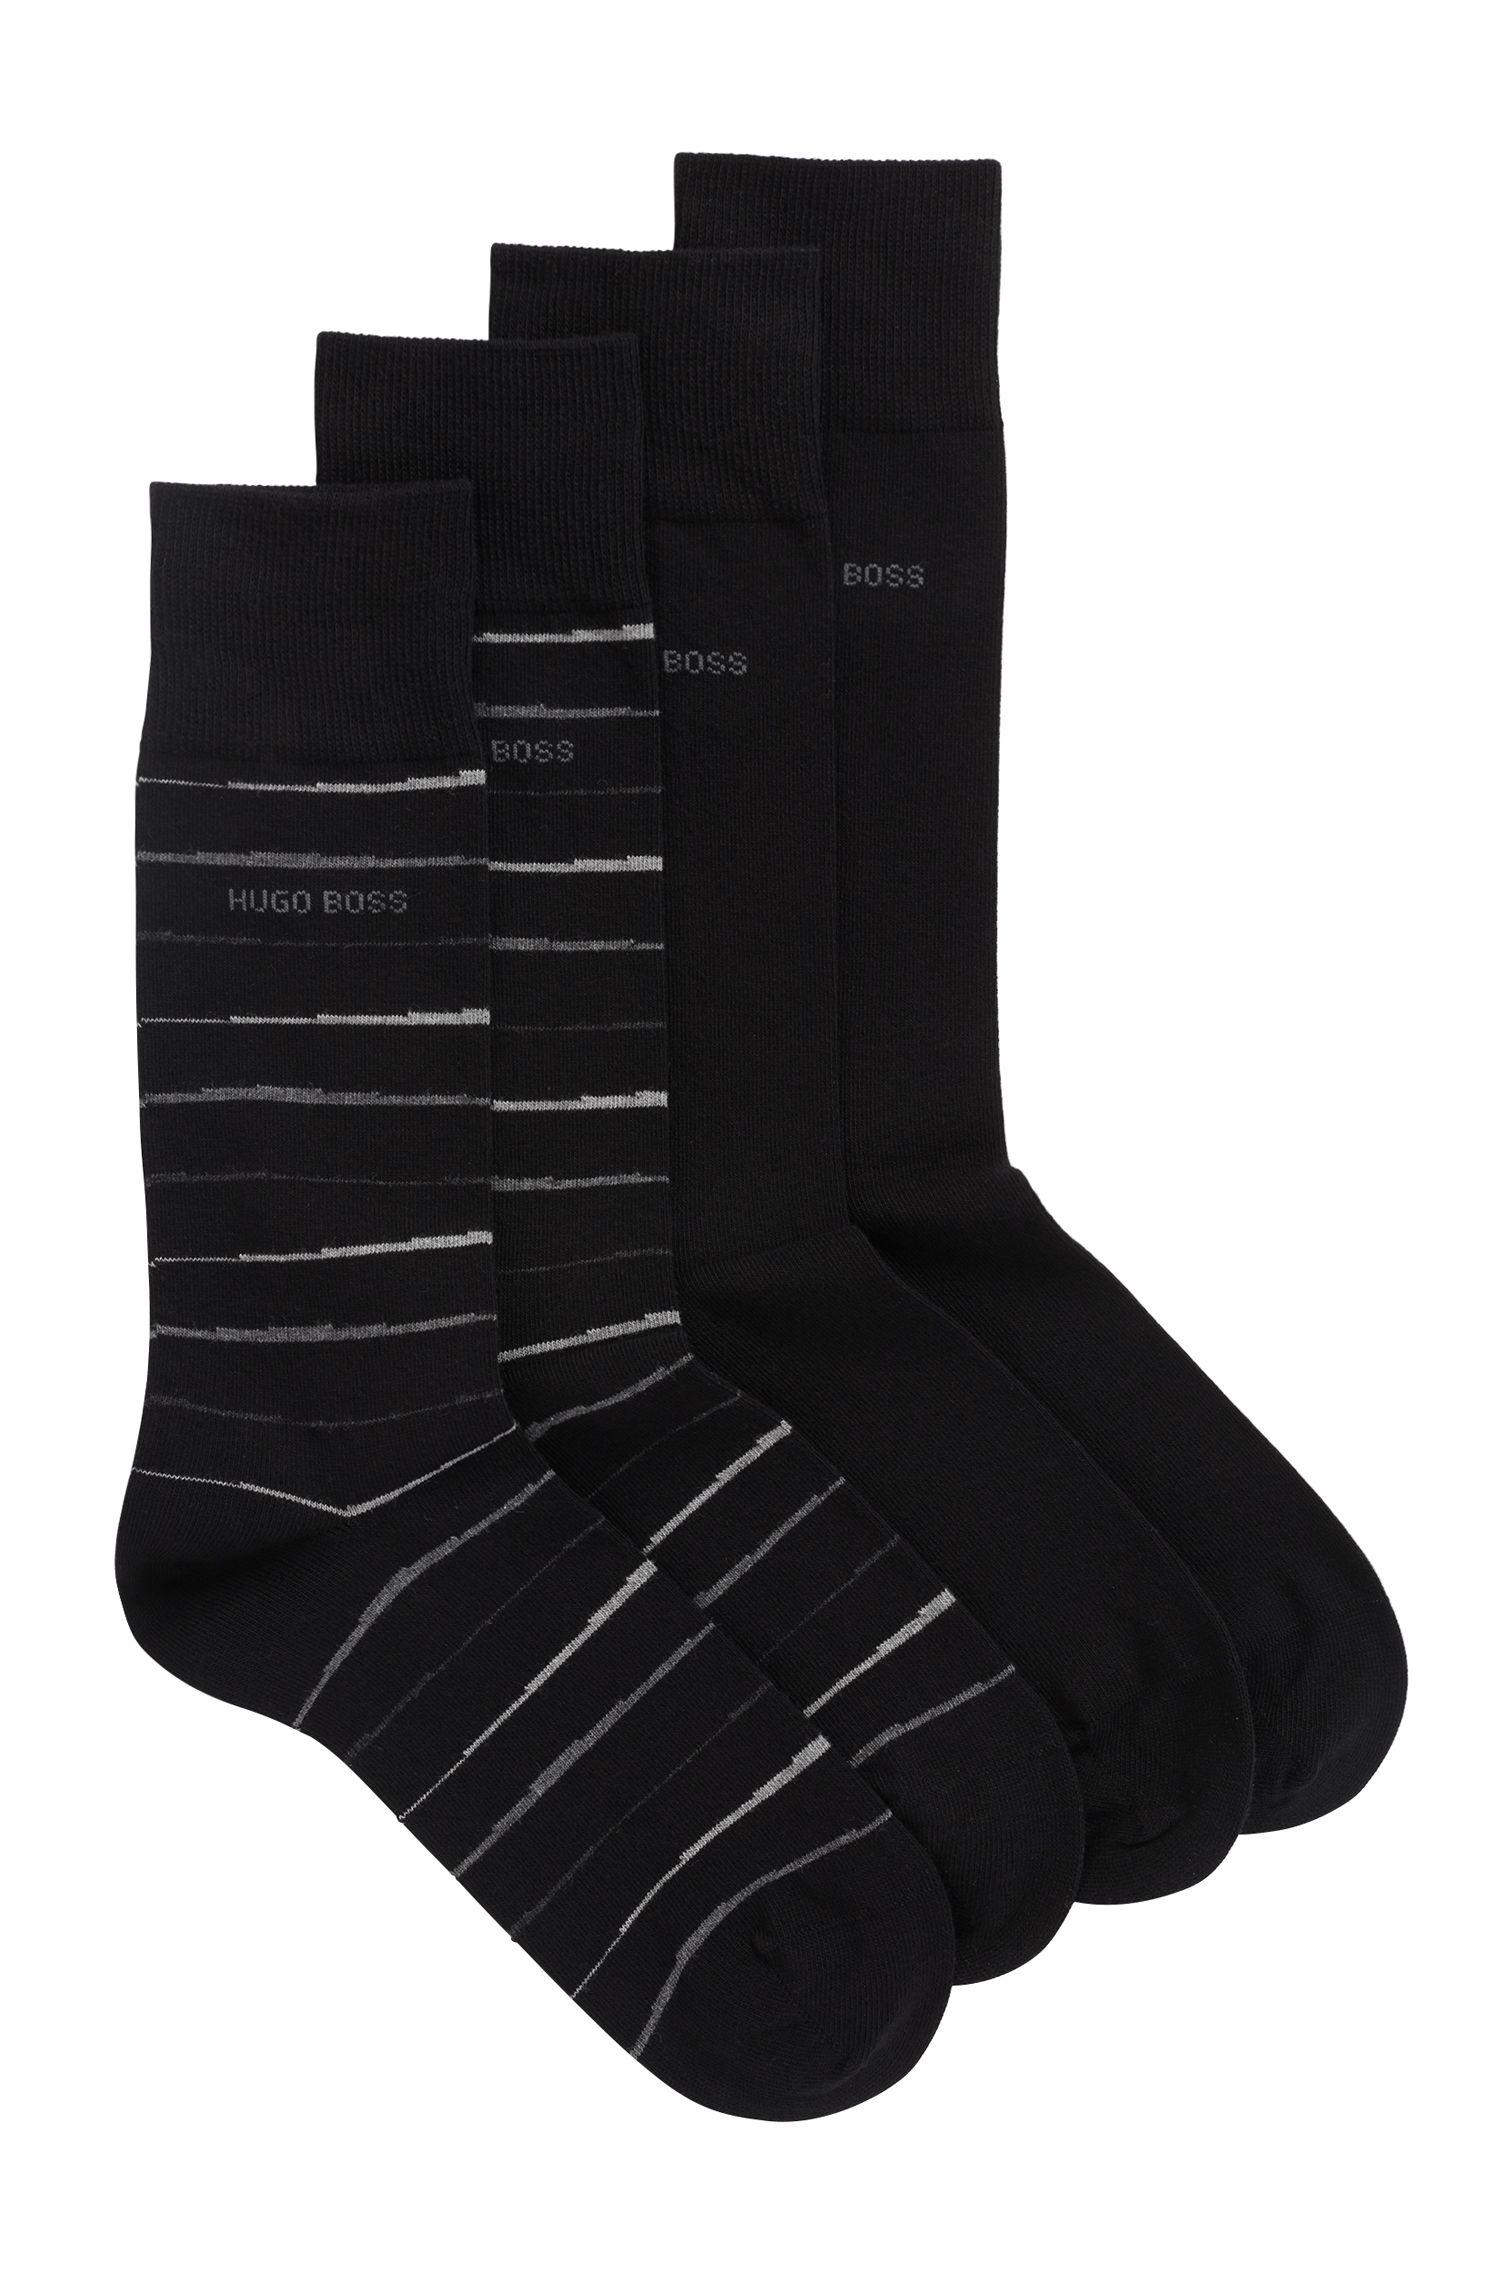 Set van twee paar sokken in standaardlengte met gekamde afwerking, Zwart